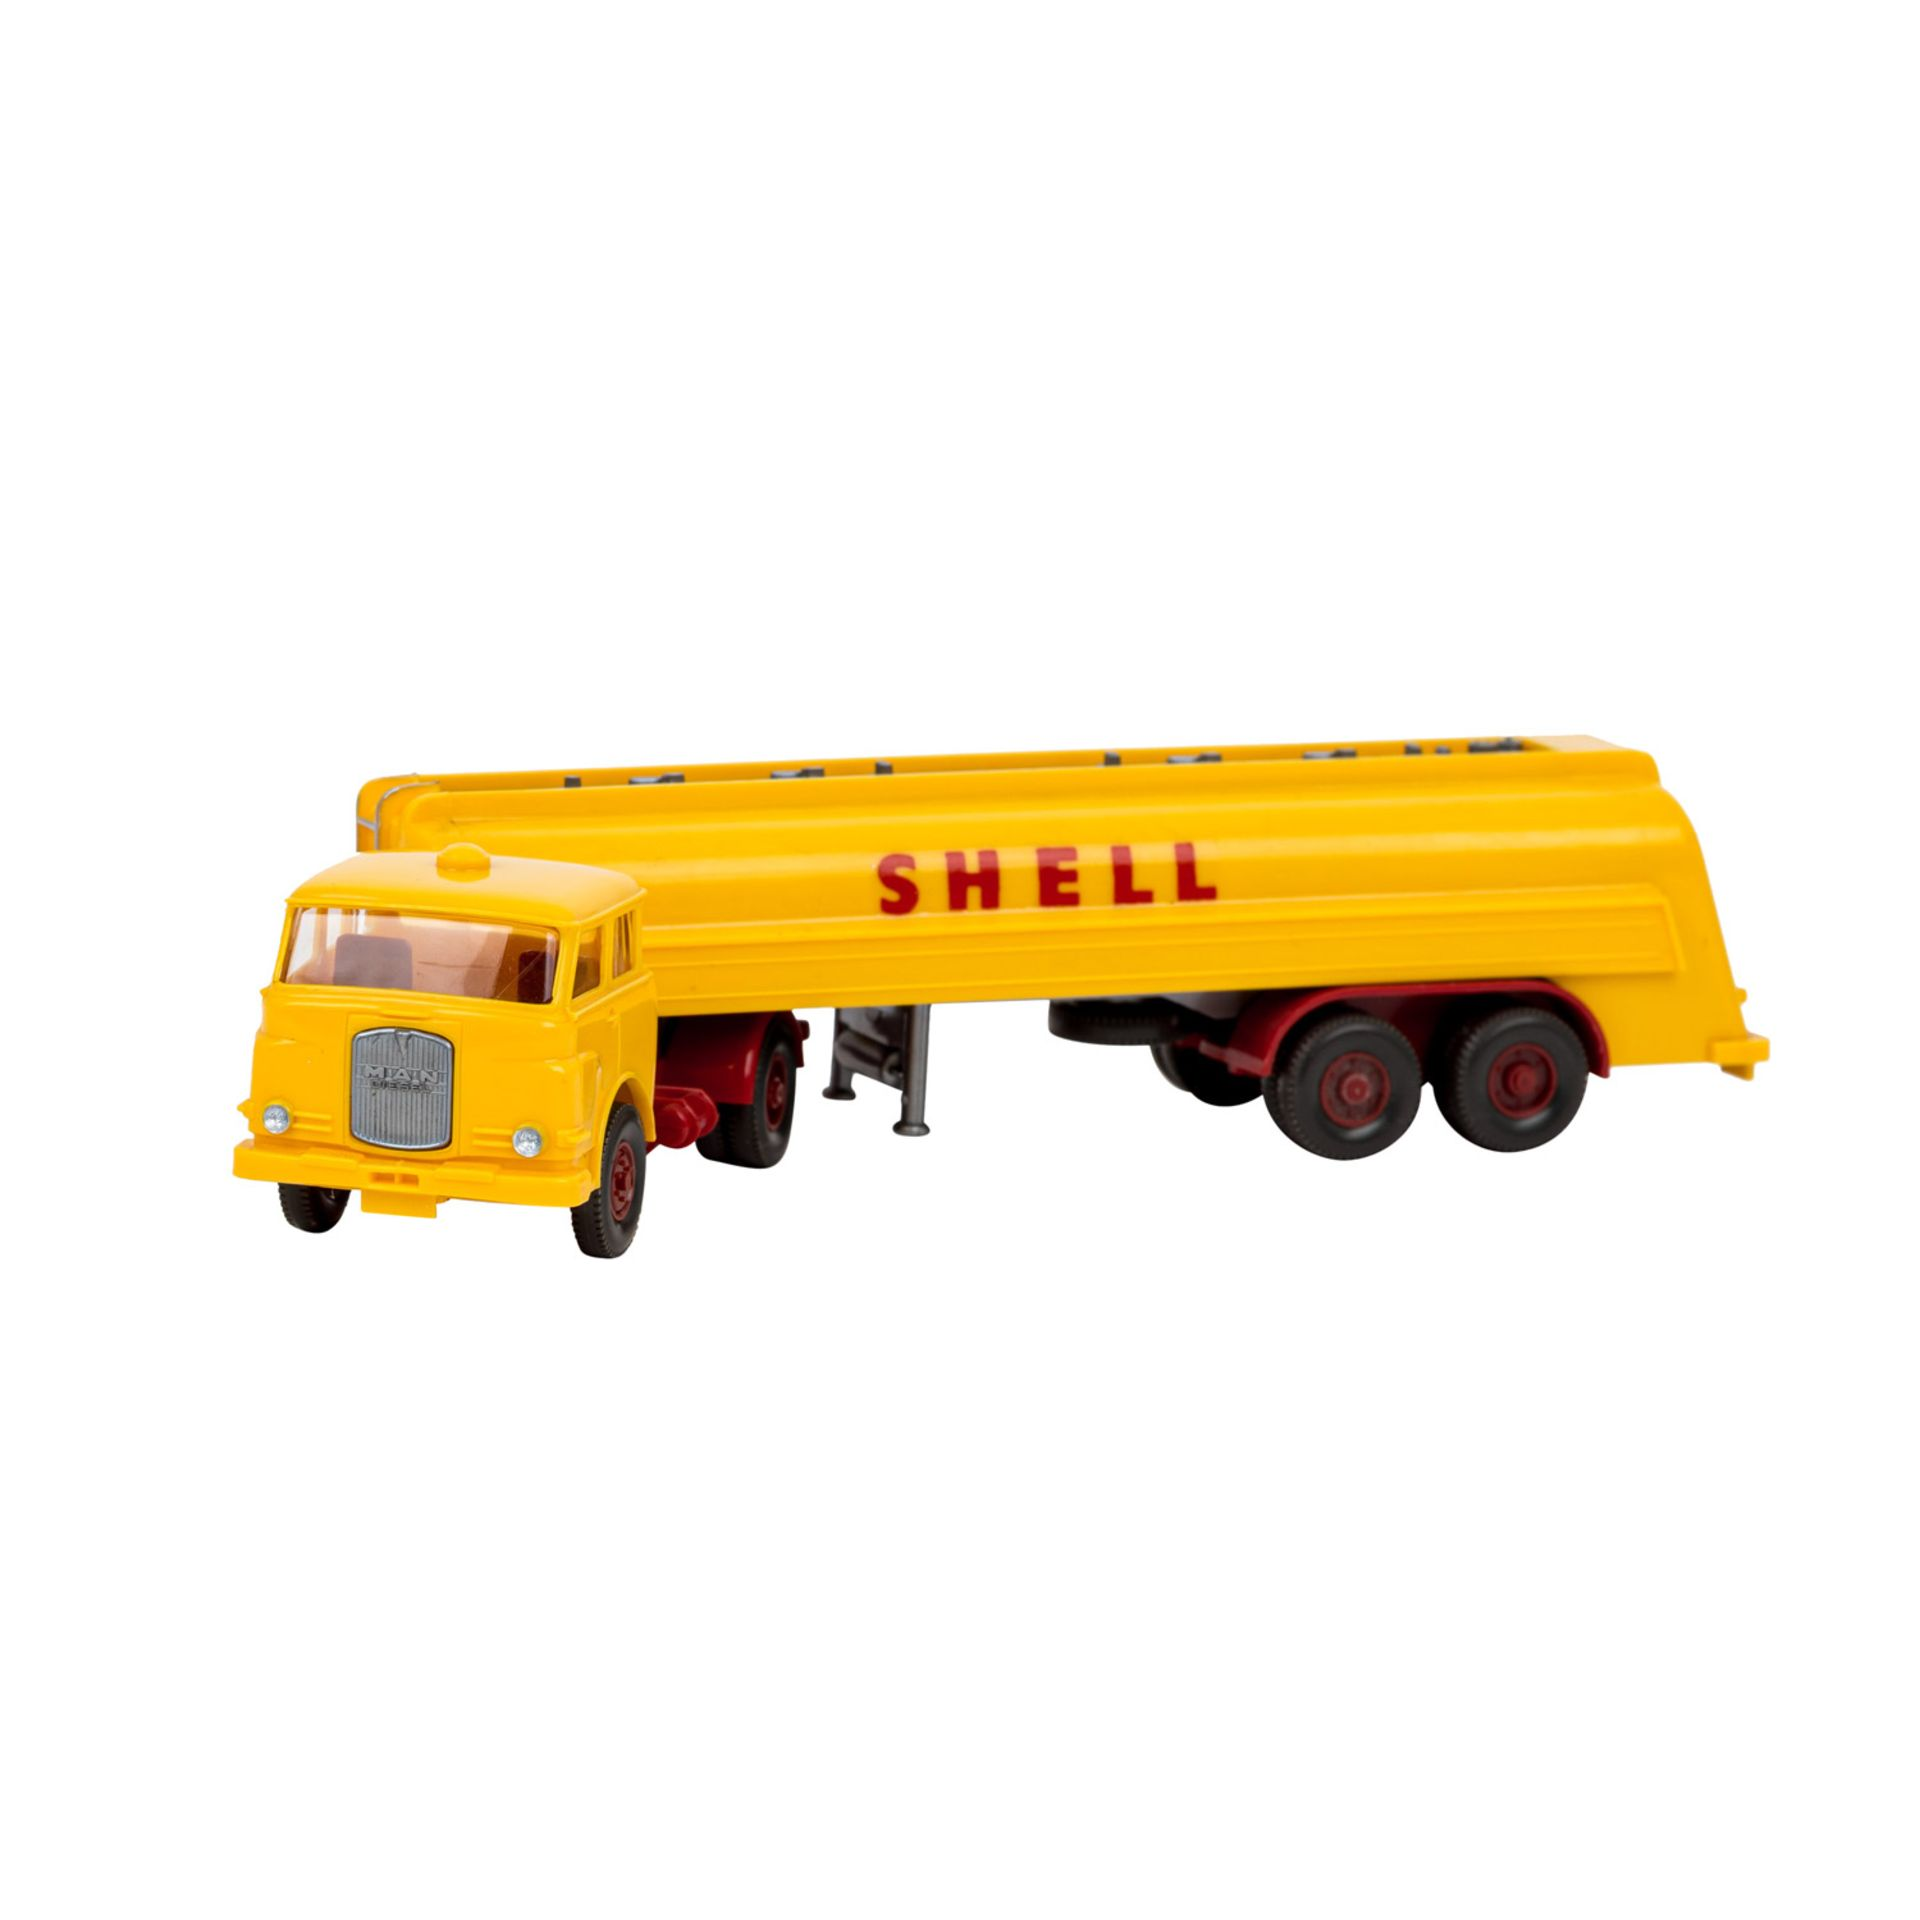 WIKING Shell-Tanksattelzug MAN 10.230, 1966,großer Shell-Tankzug, Zugmaschine mit int